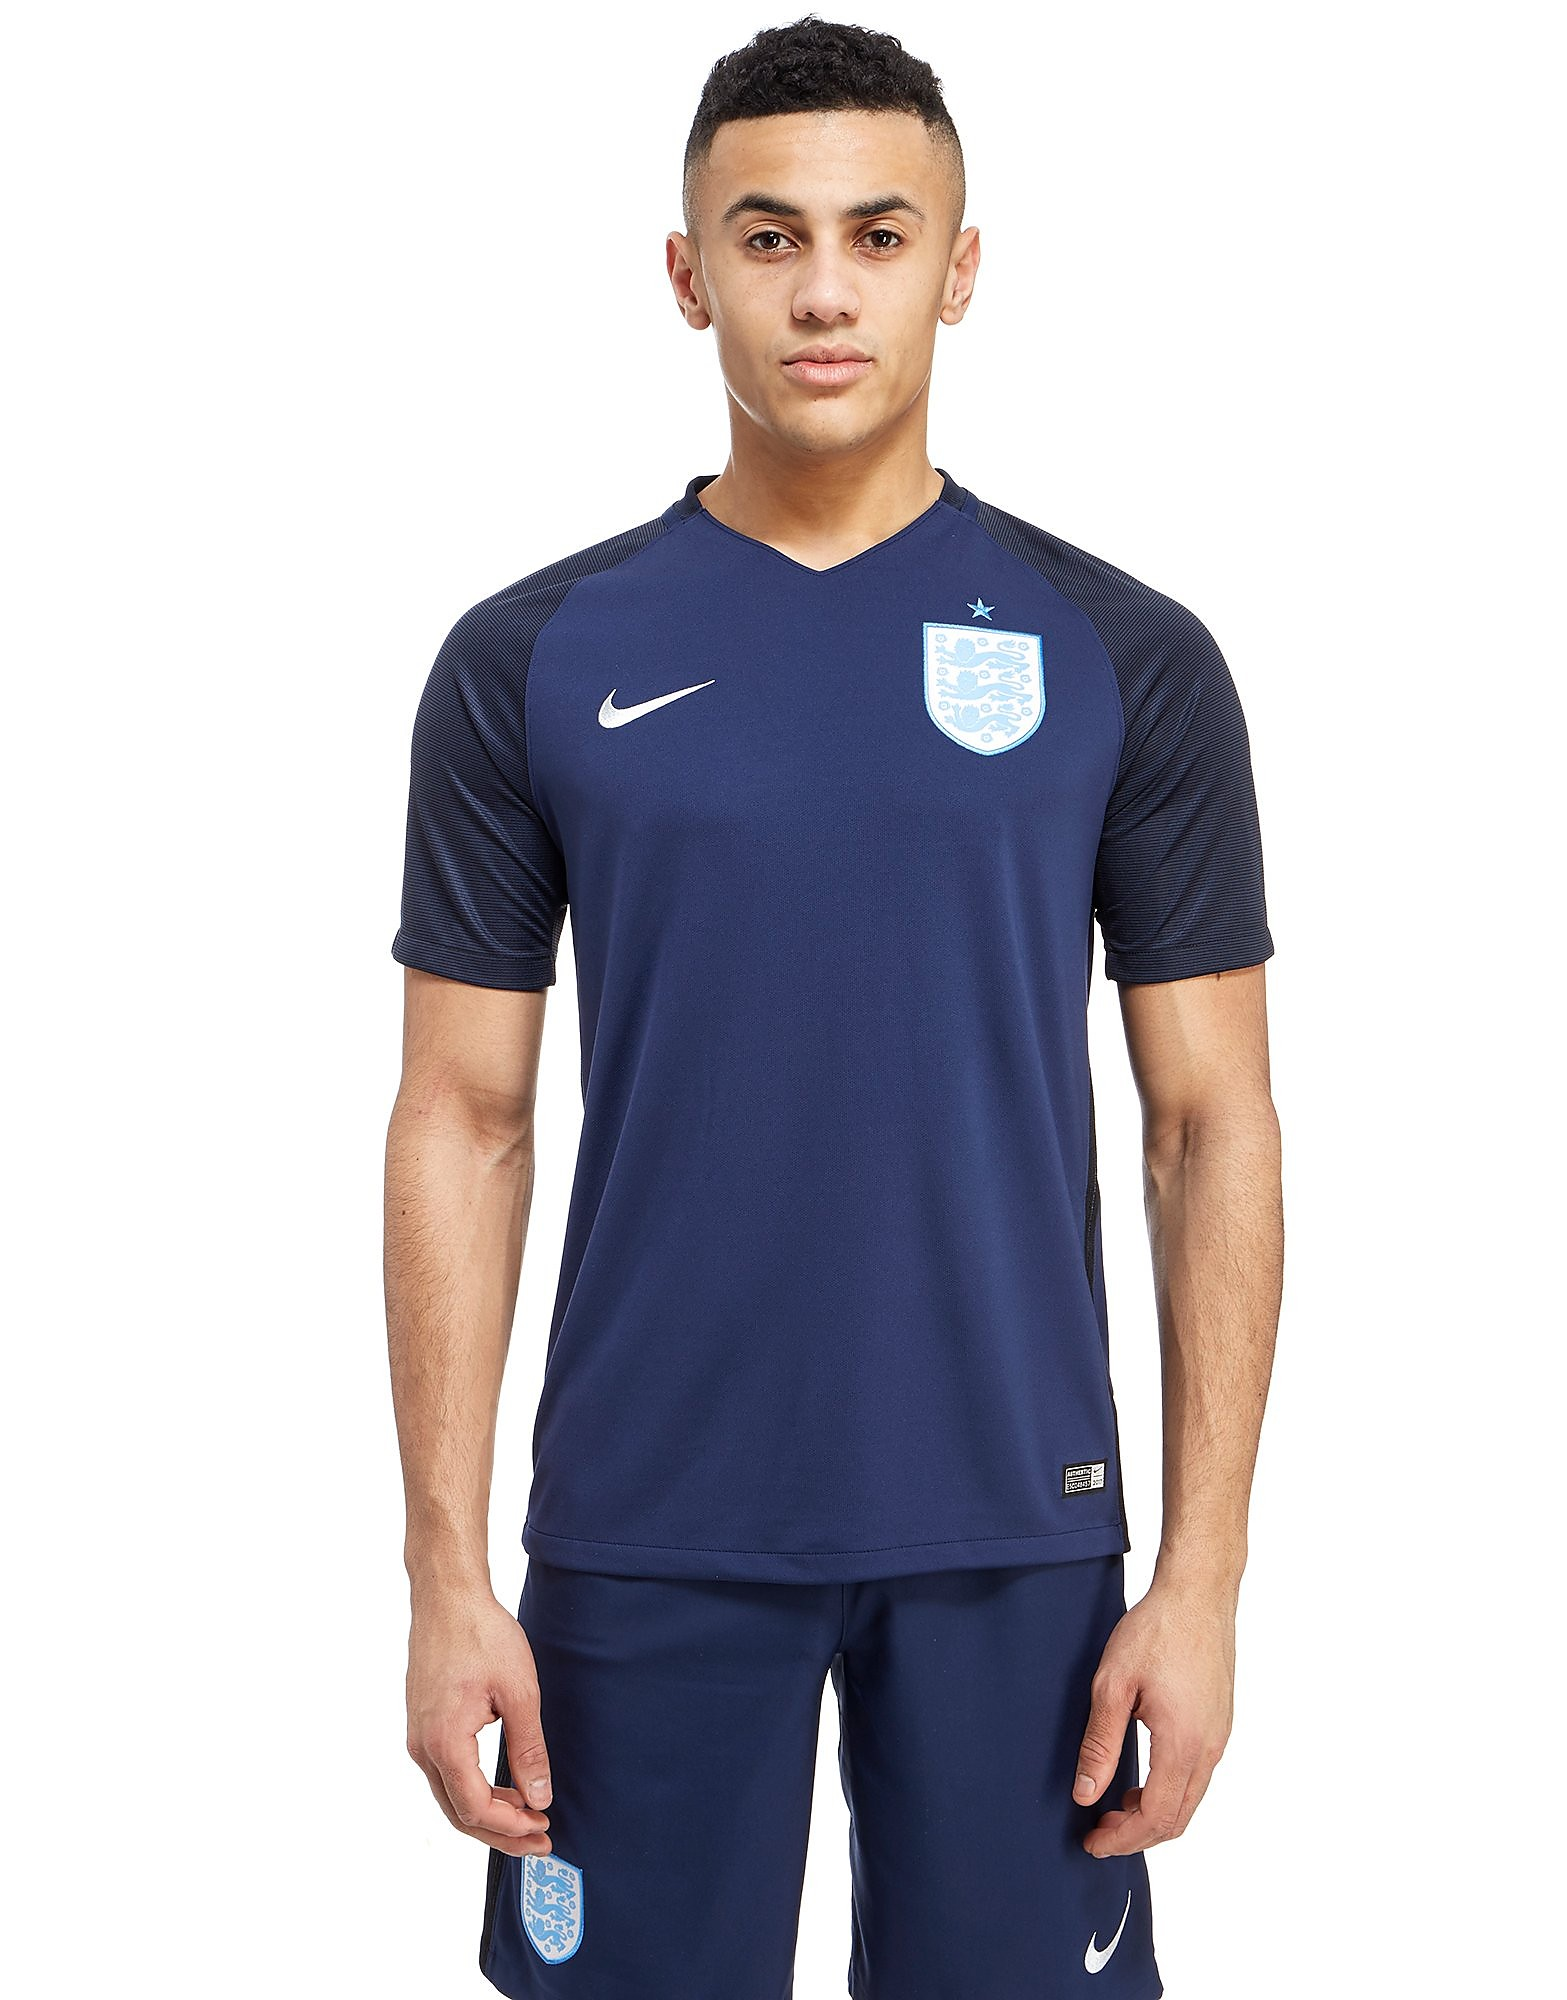 Nike T-shirt Extérieur Angleterre 2017